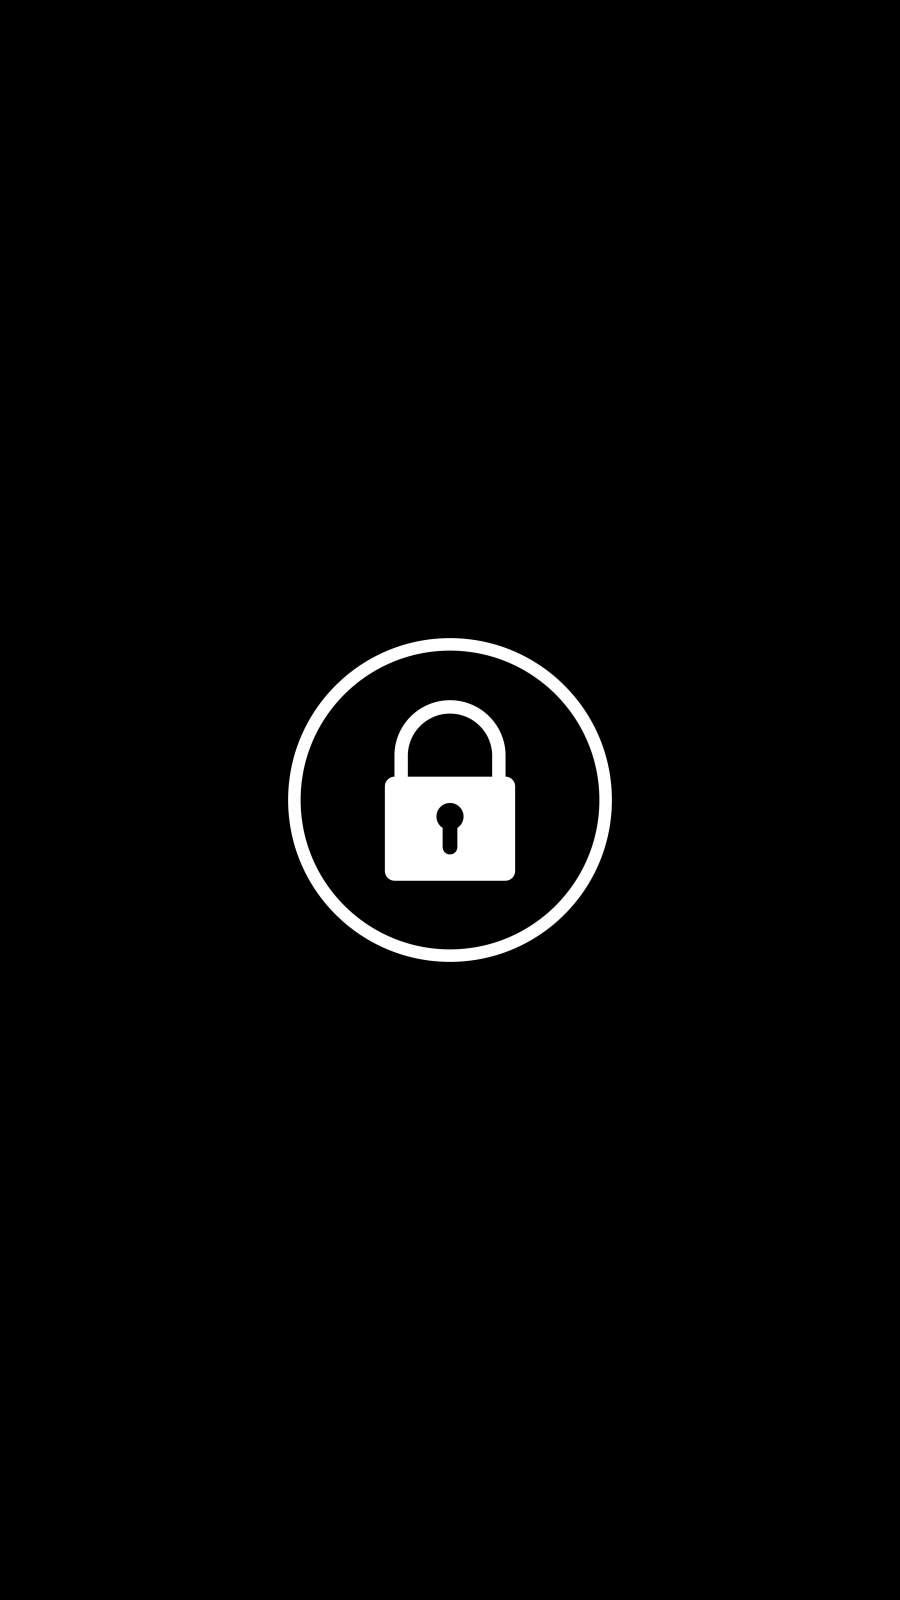 Screen Lock iPhone Wallpaper